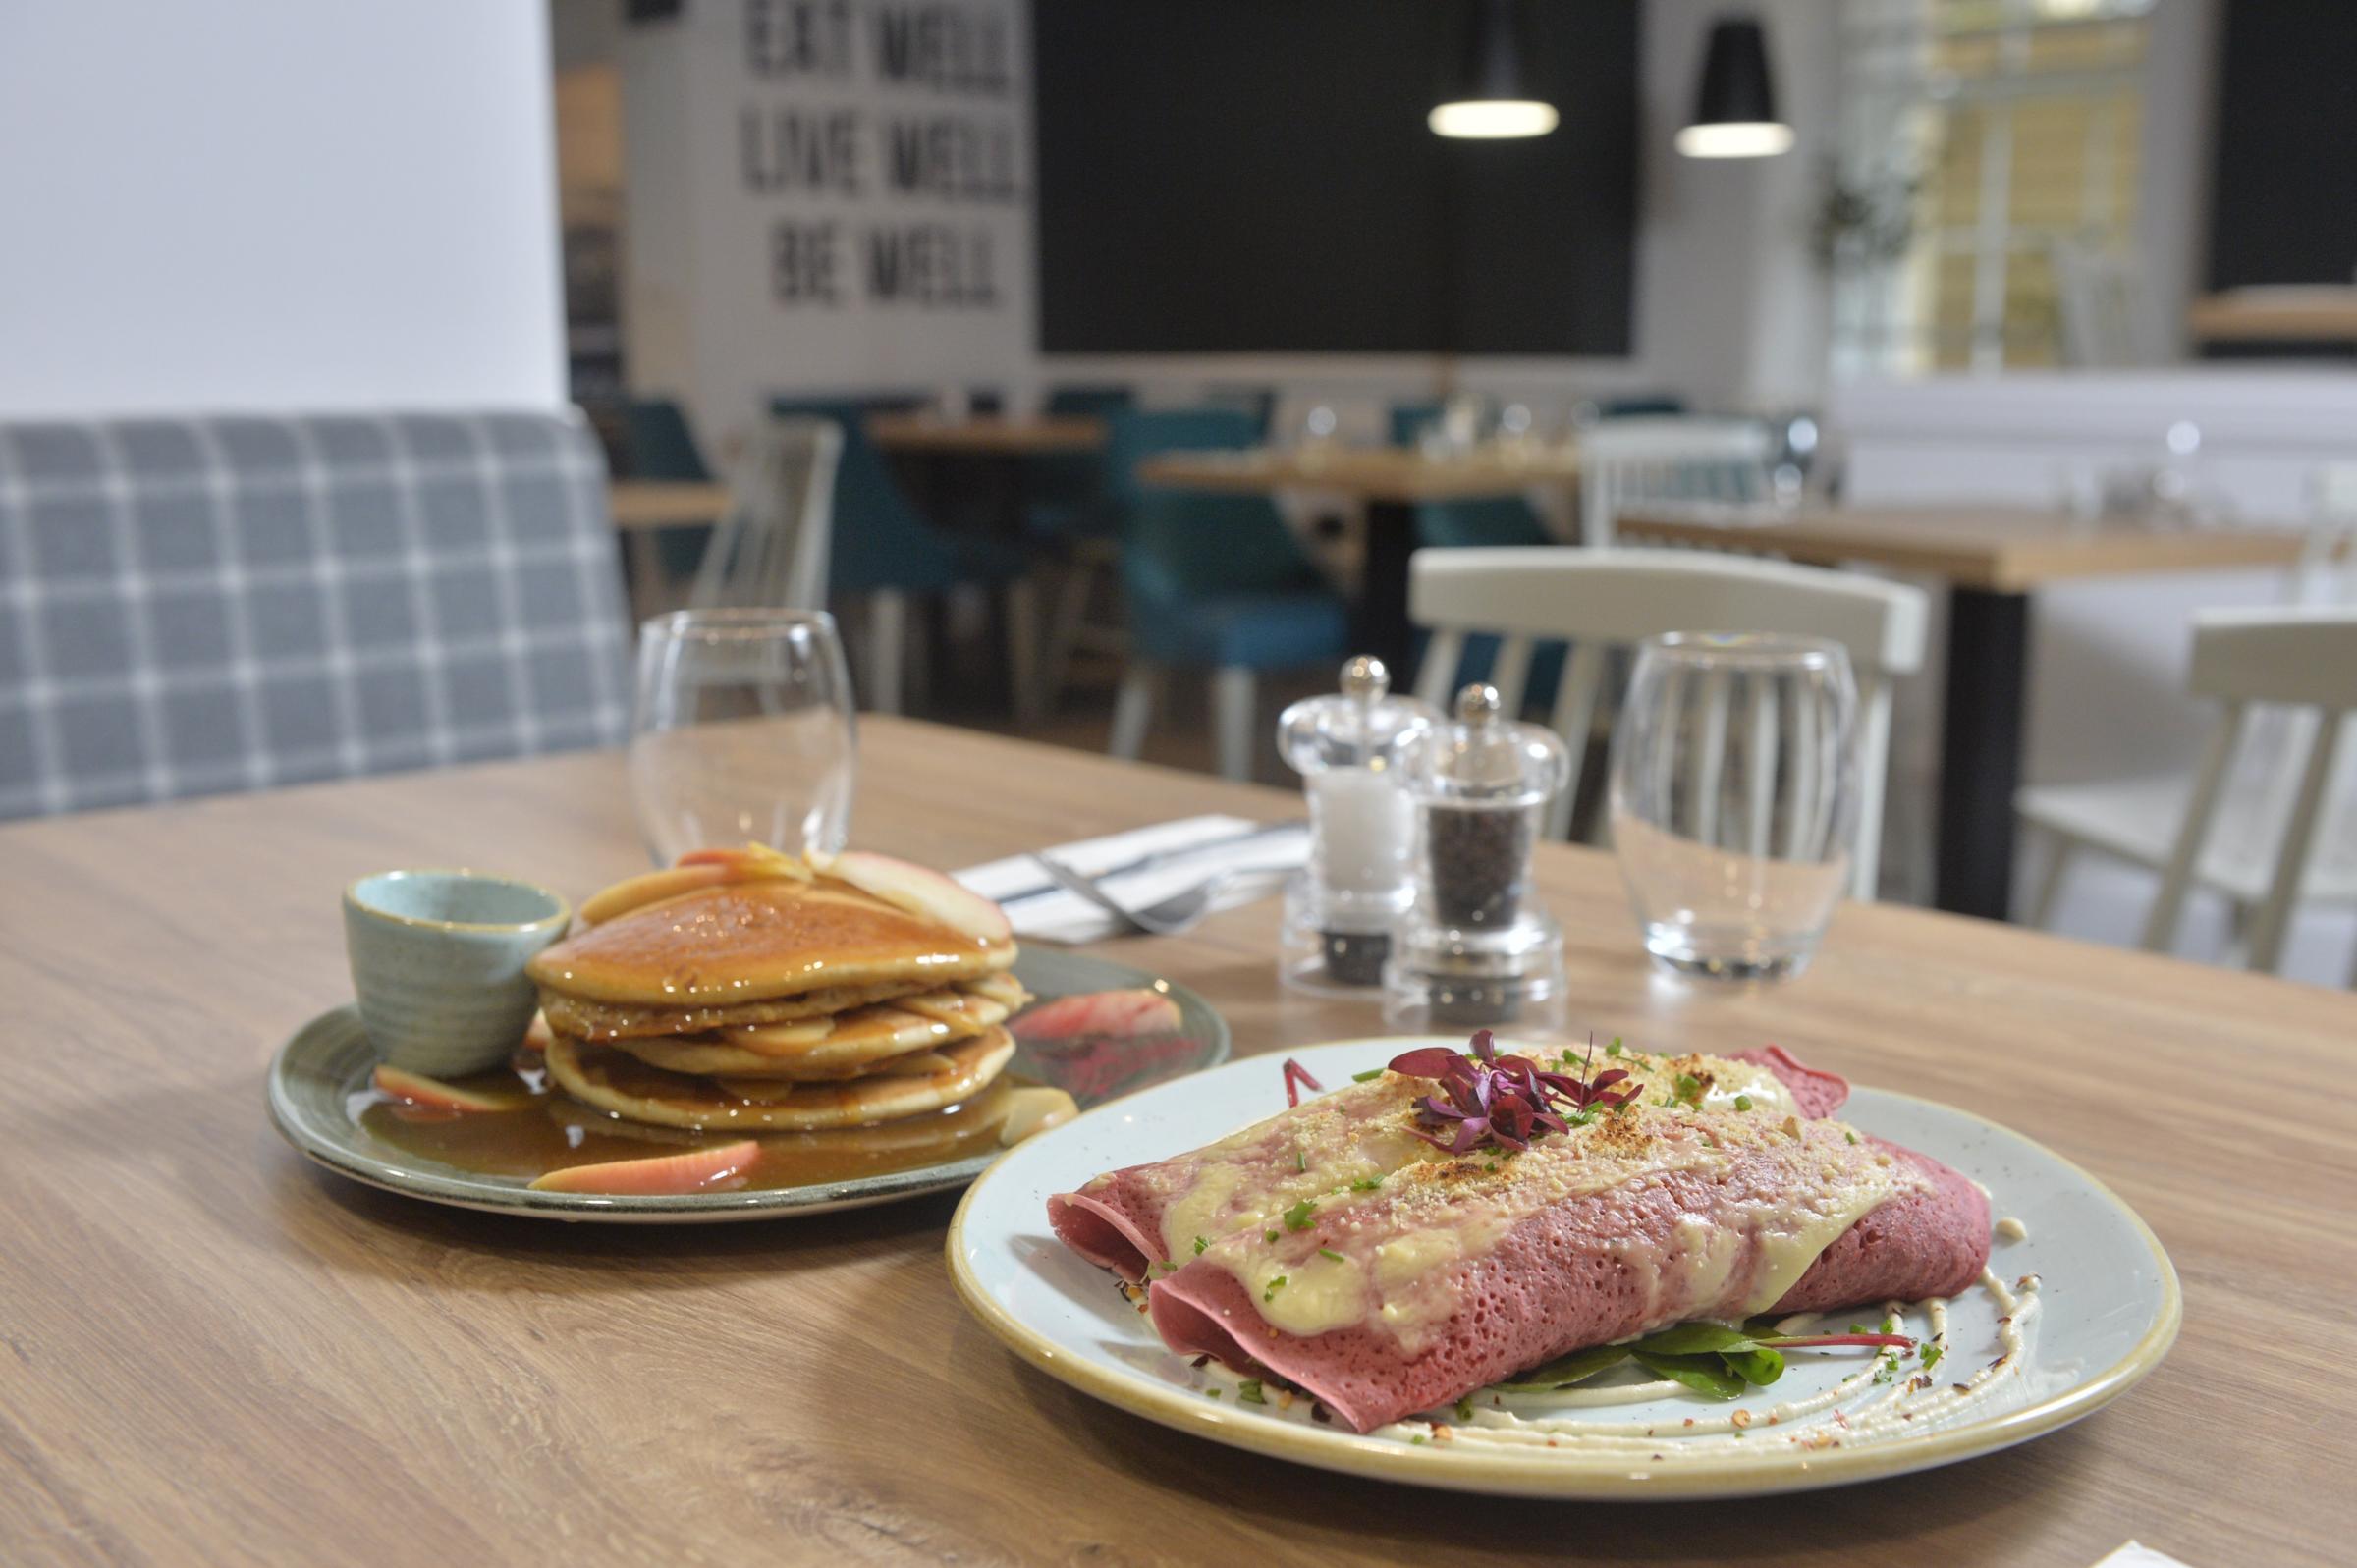 Glasgow's vegan Soul Food Kitchen, reviewed by Ron Mackenna